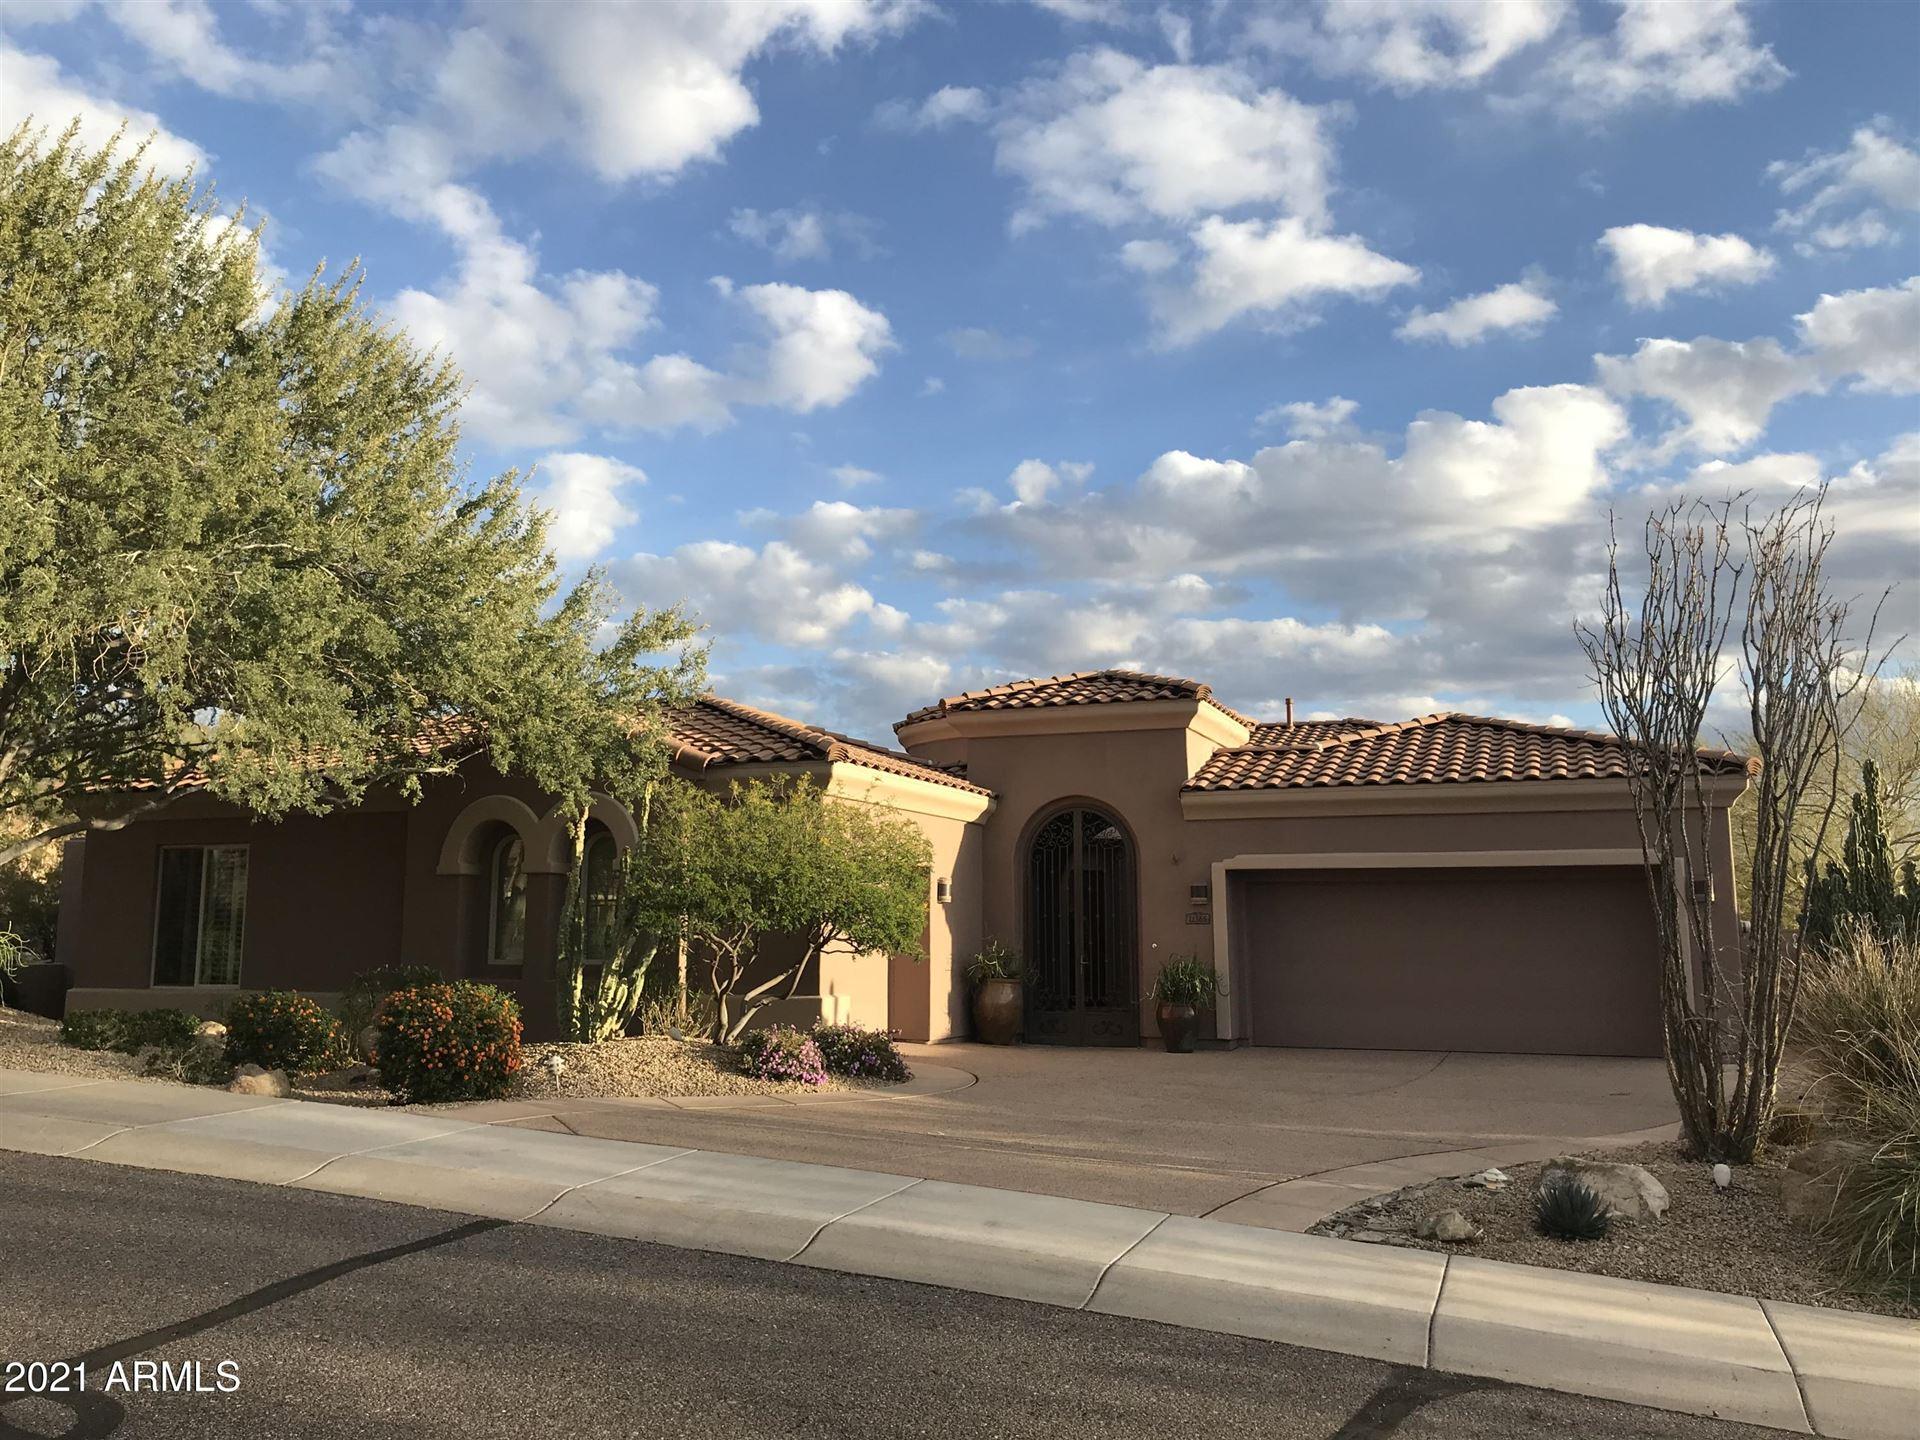 Photo of 11365 E GREENWAY Road, Scottsdale, AZ 85255 (MLS # 6207754)